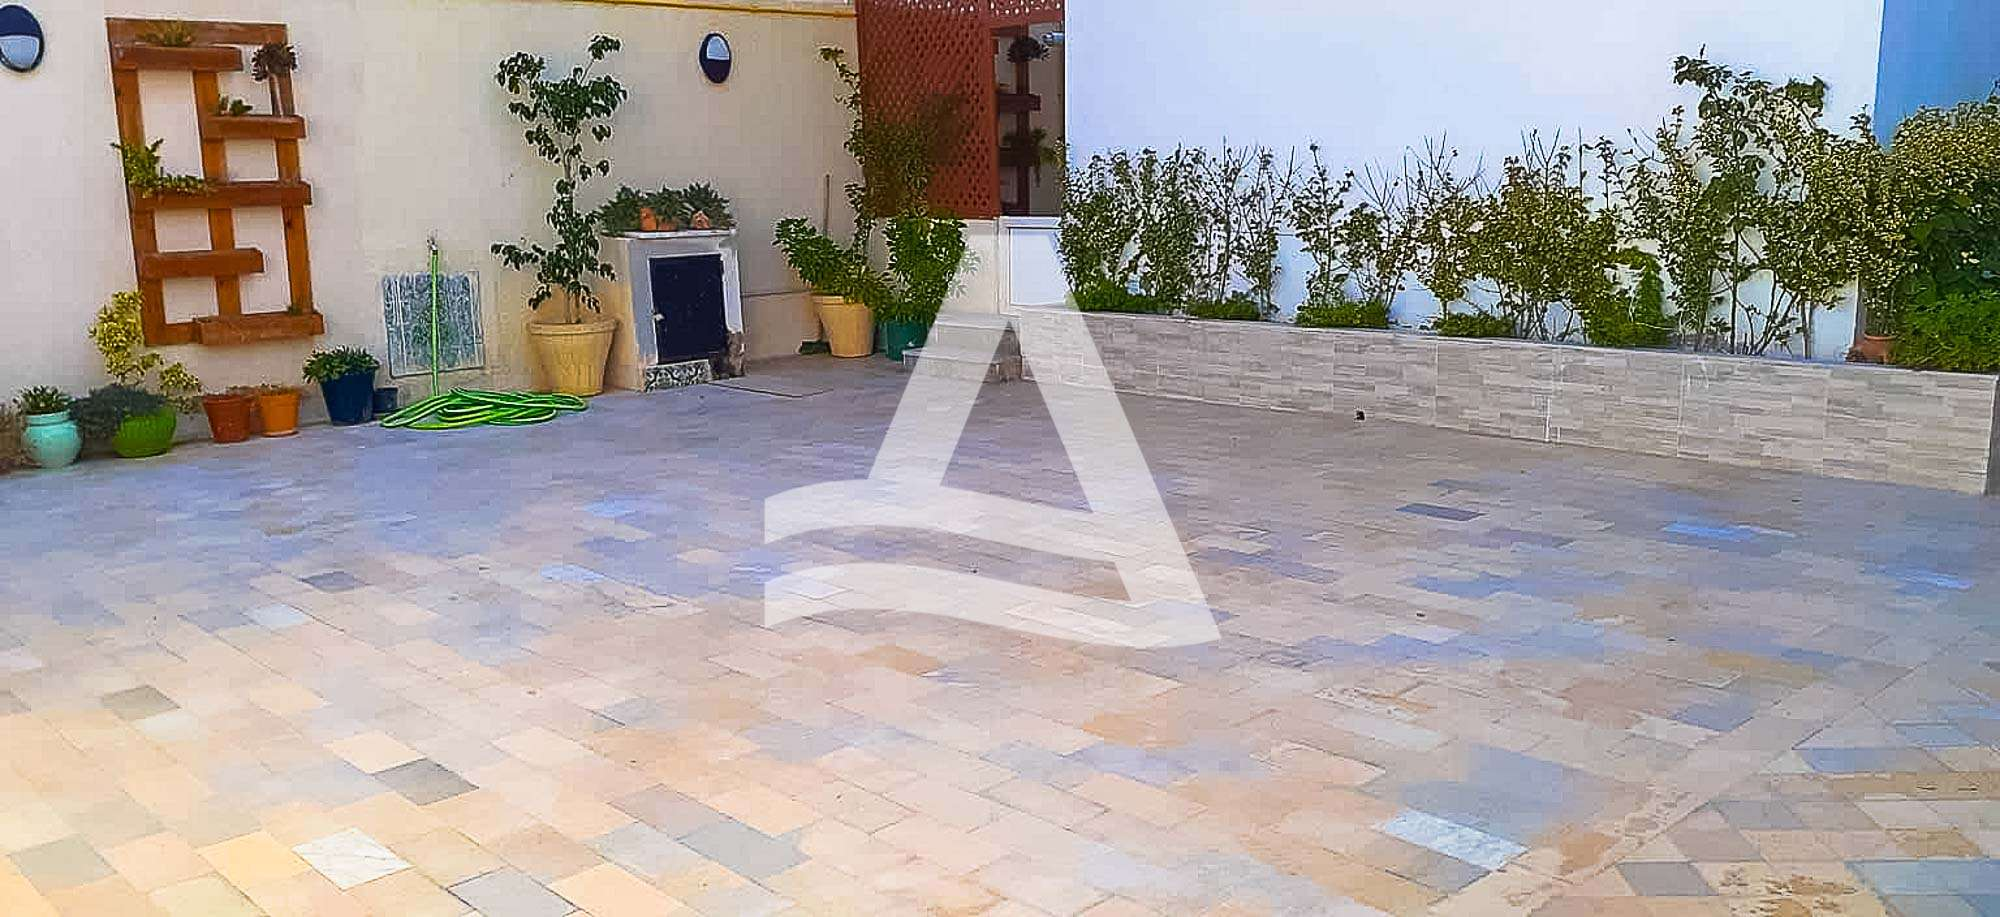 httpss3.amazonaws.comlogimoaws_Arcane_immobilière_la_Marsa-_location_-_vente_la_marsa_1_sur_21_1574354370757-1